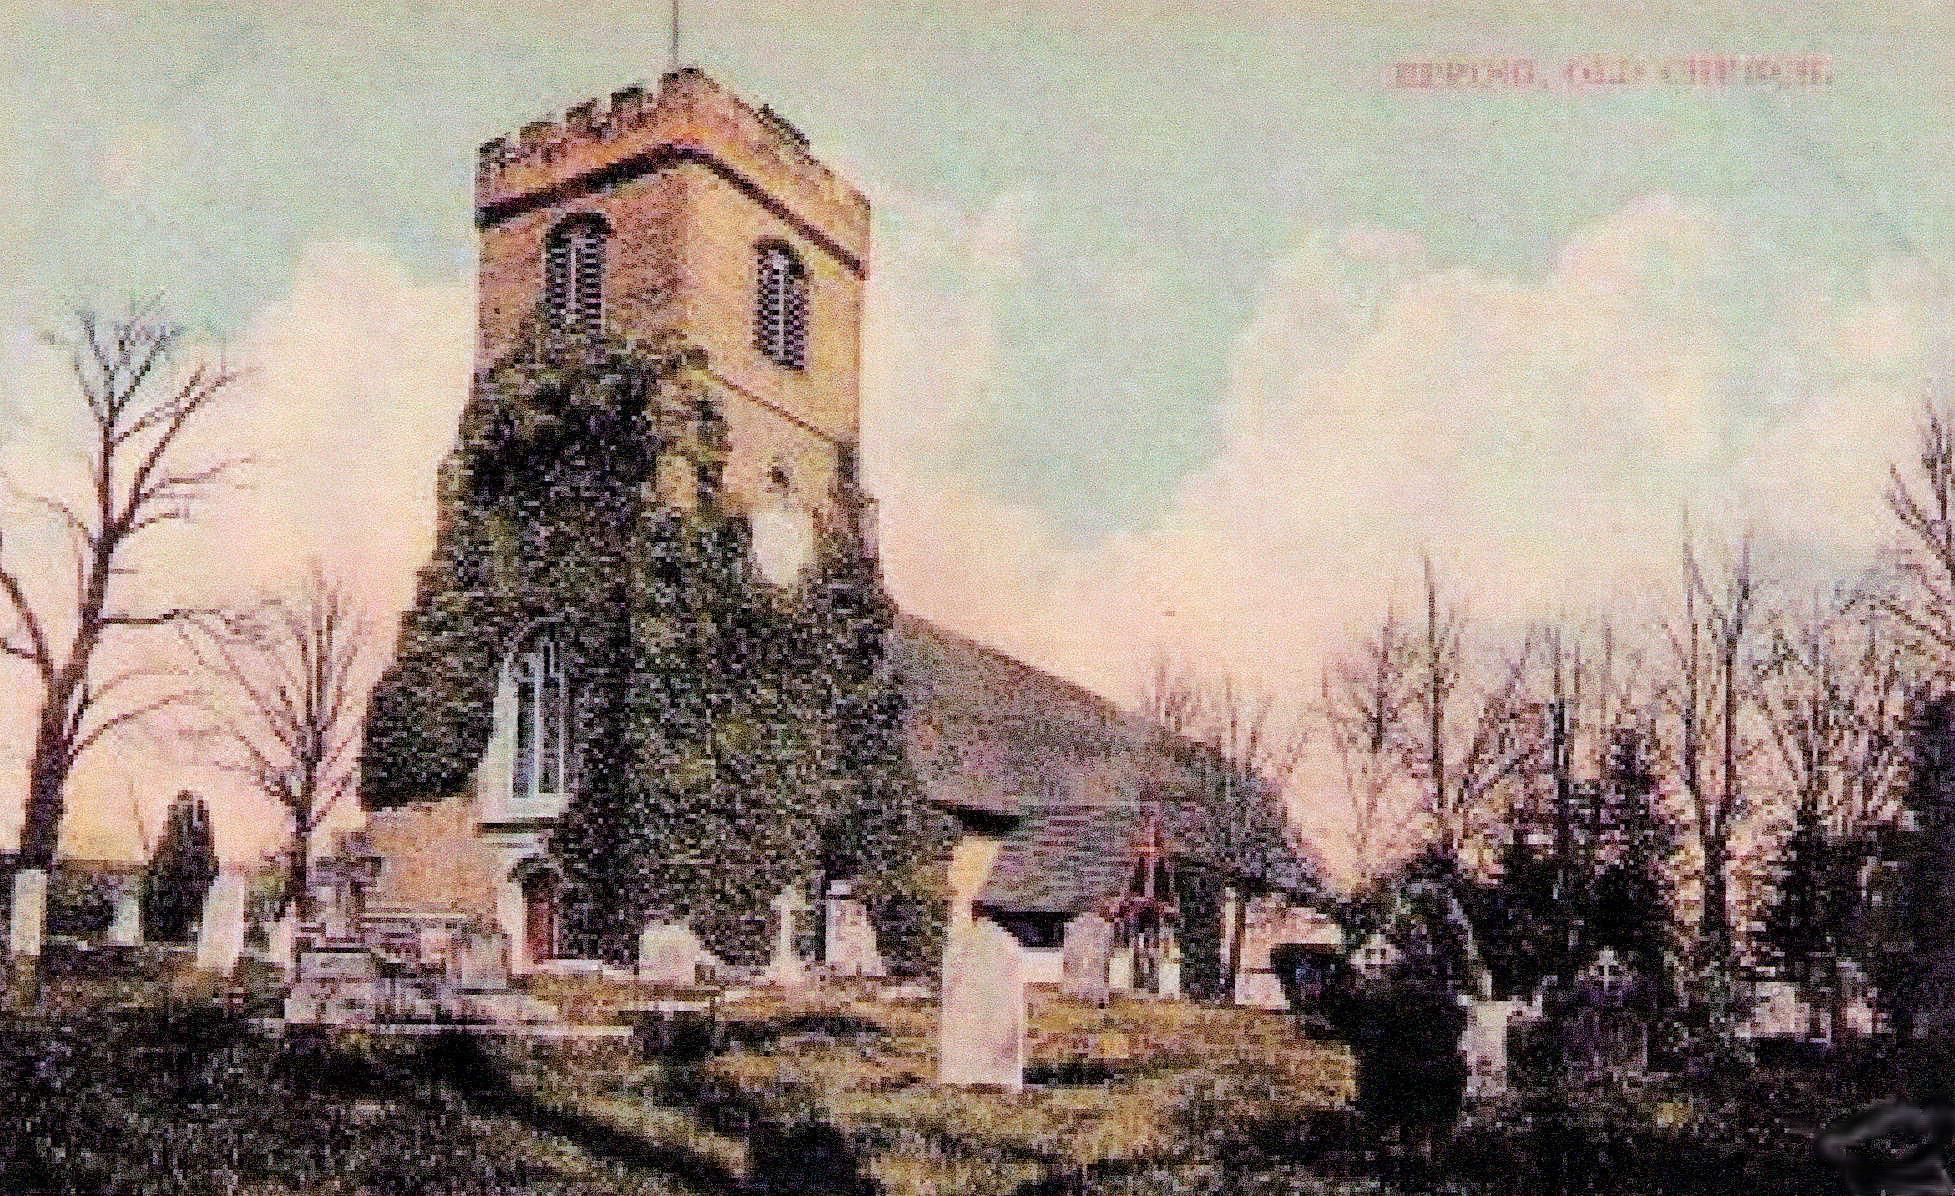 092 EPPING UPLAND CHURCH